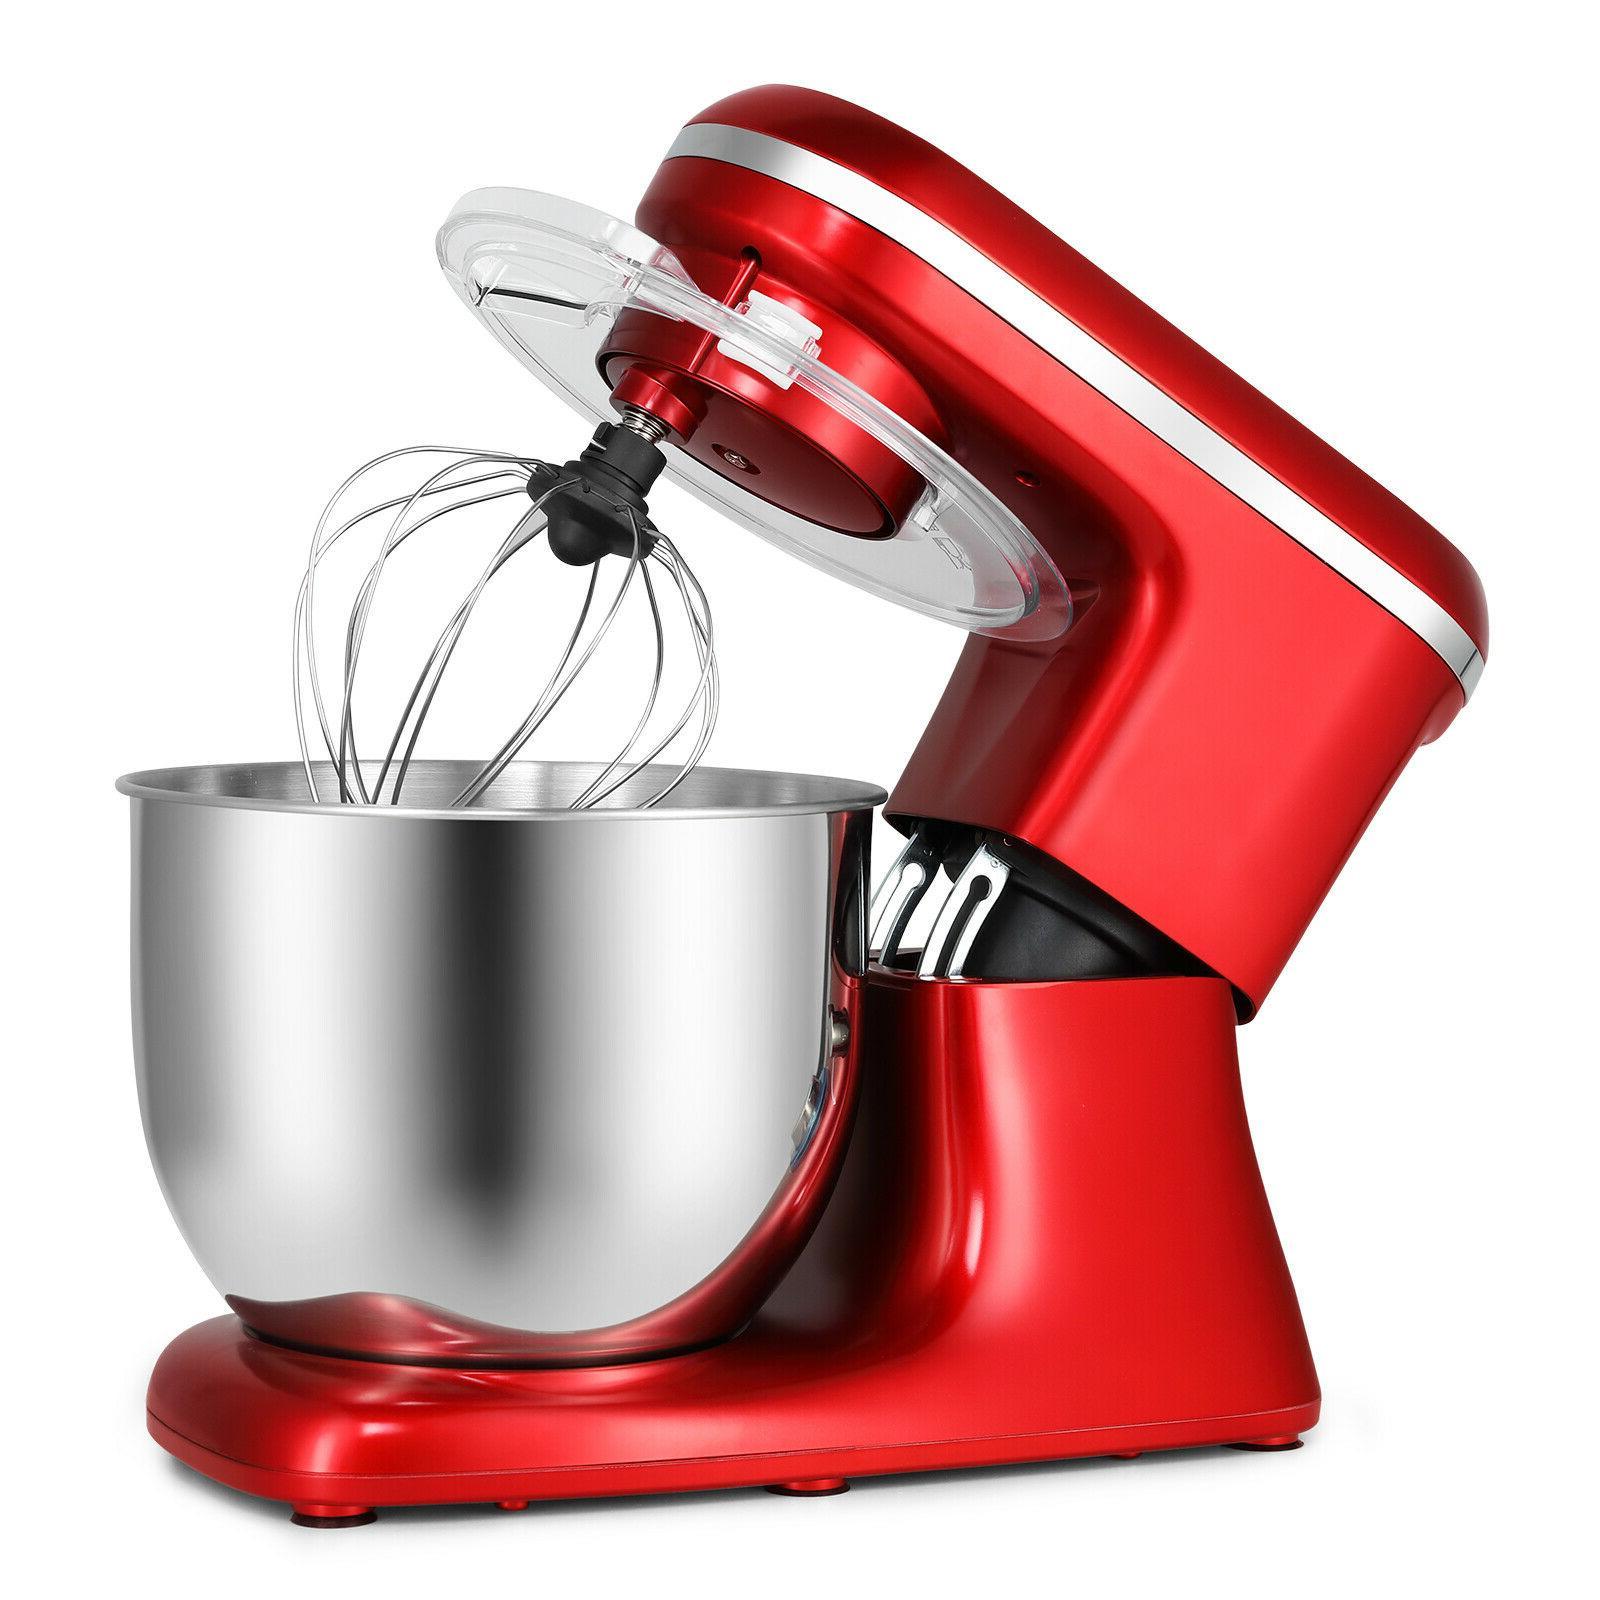 Pro Food Stand Mixer 7-QT Kitchen Bowl